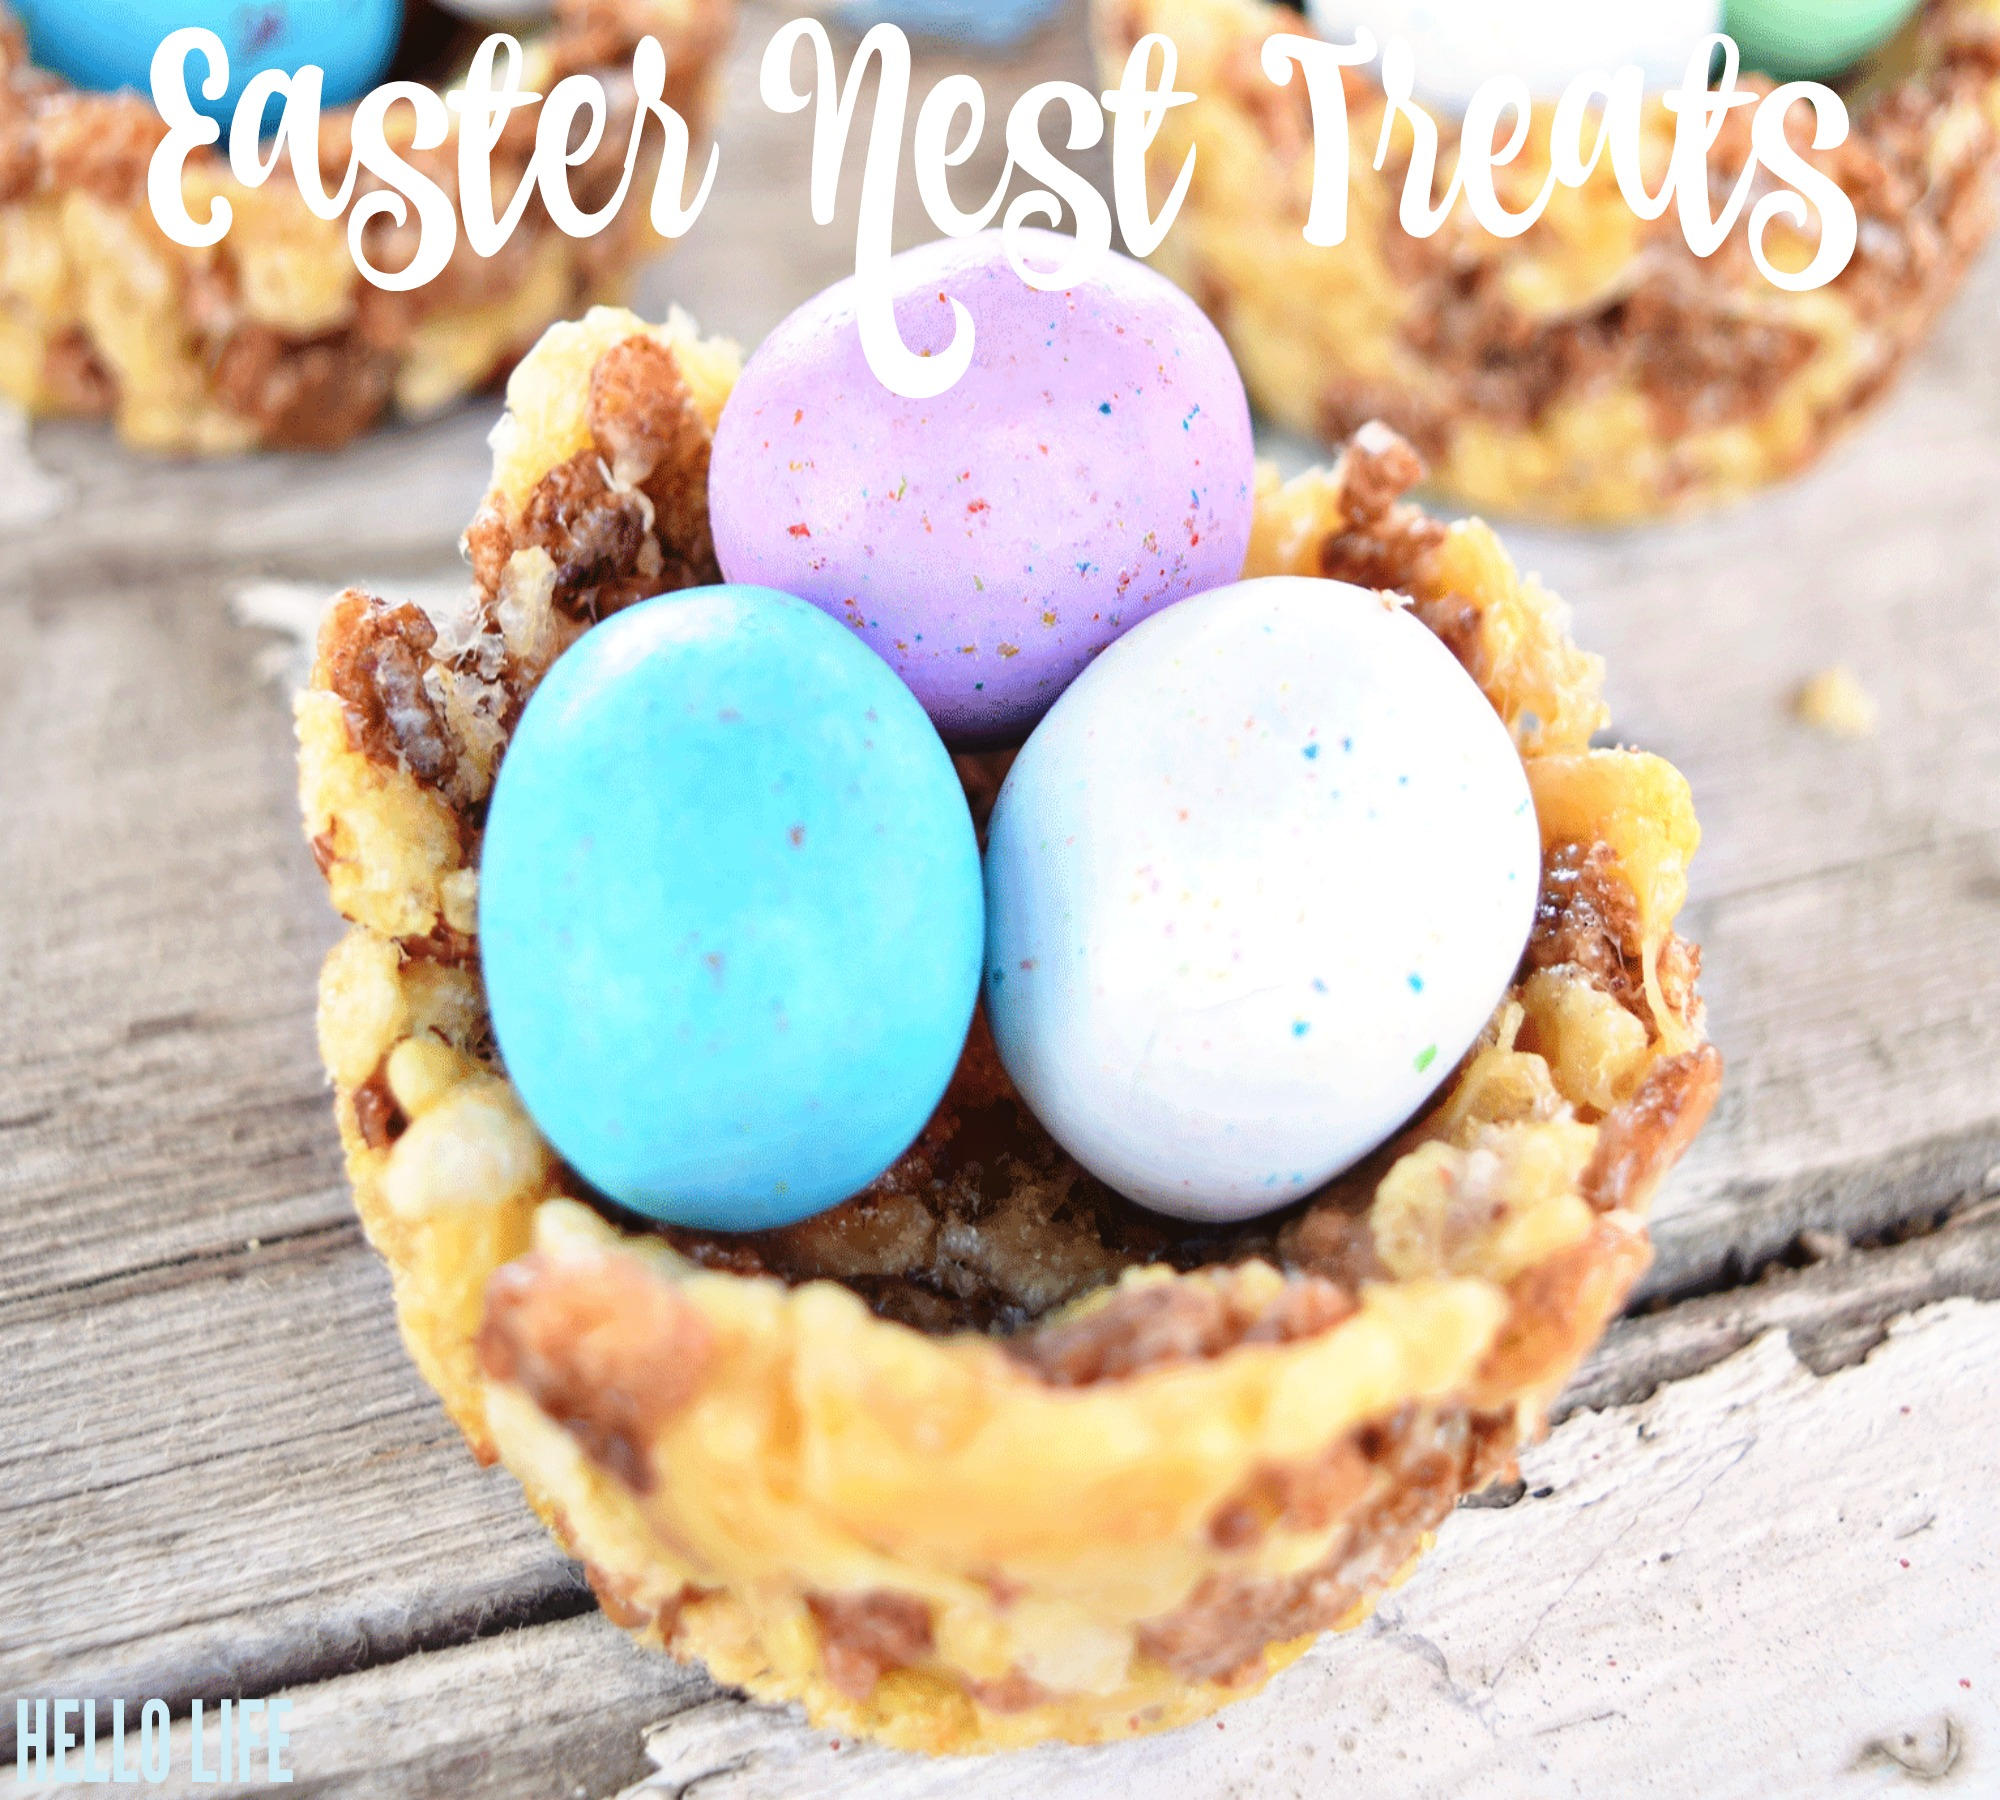 Easter-Rice-Treat-via-Hello Life Hellolifeonline.com